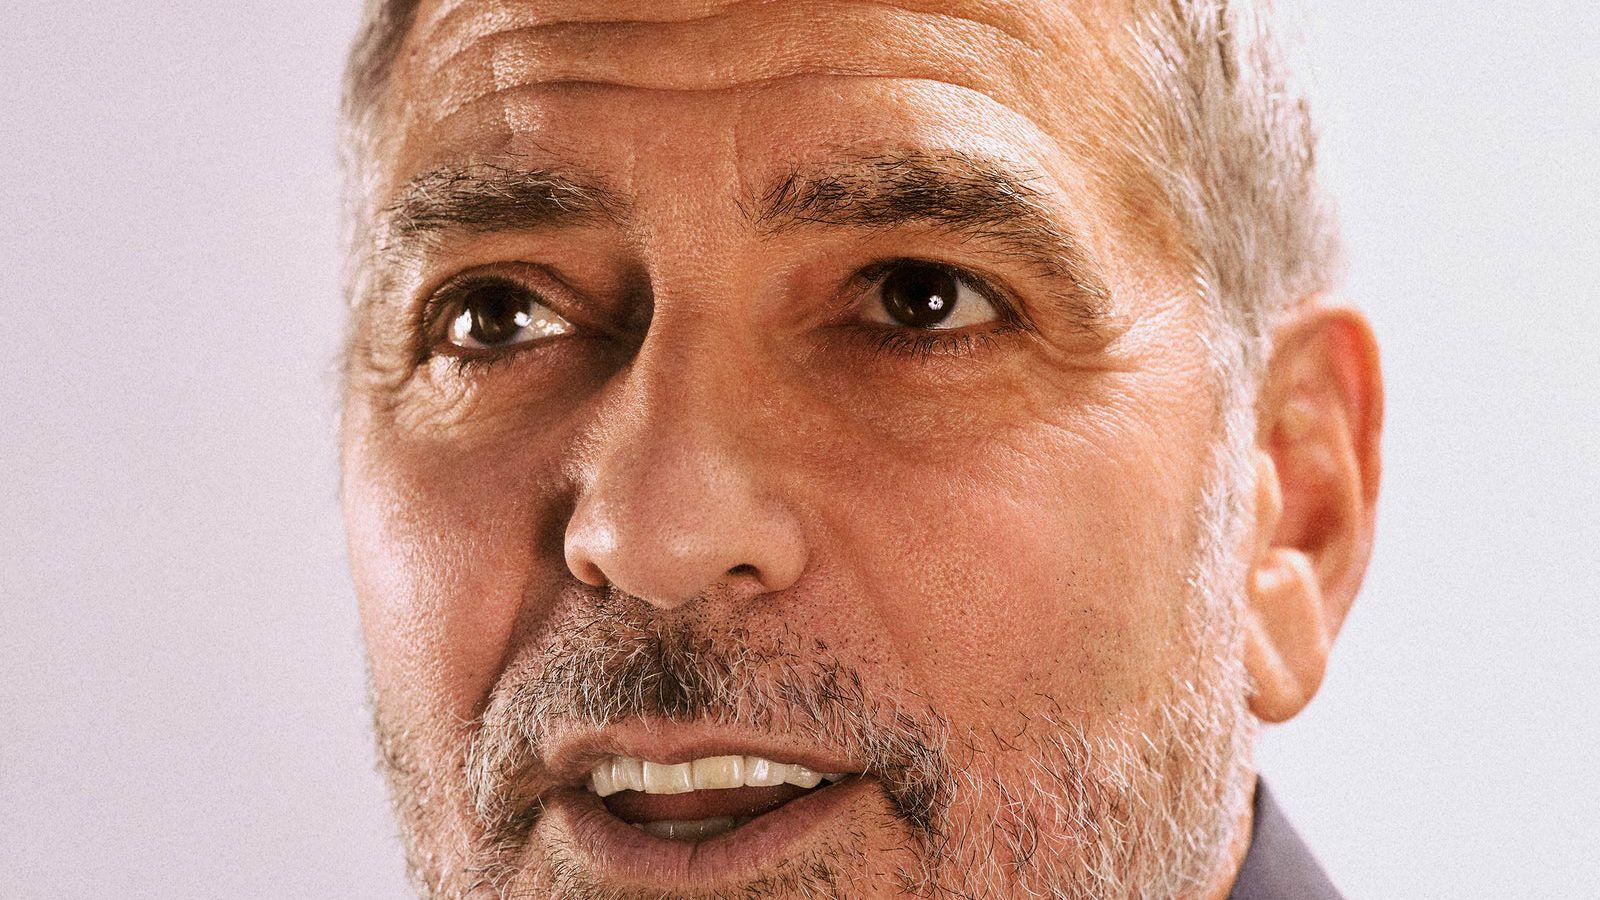 George Clooney: O «Άντρας της Χρονιάς» μιλάει για το πόσο άλλαξε τη ζωή του ο έρωτας και η Amal [pics]